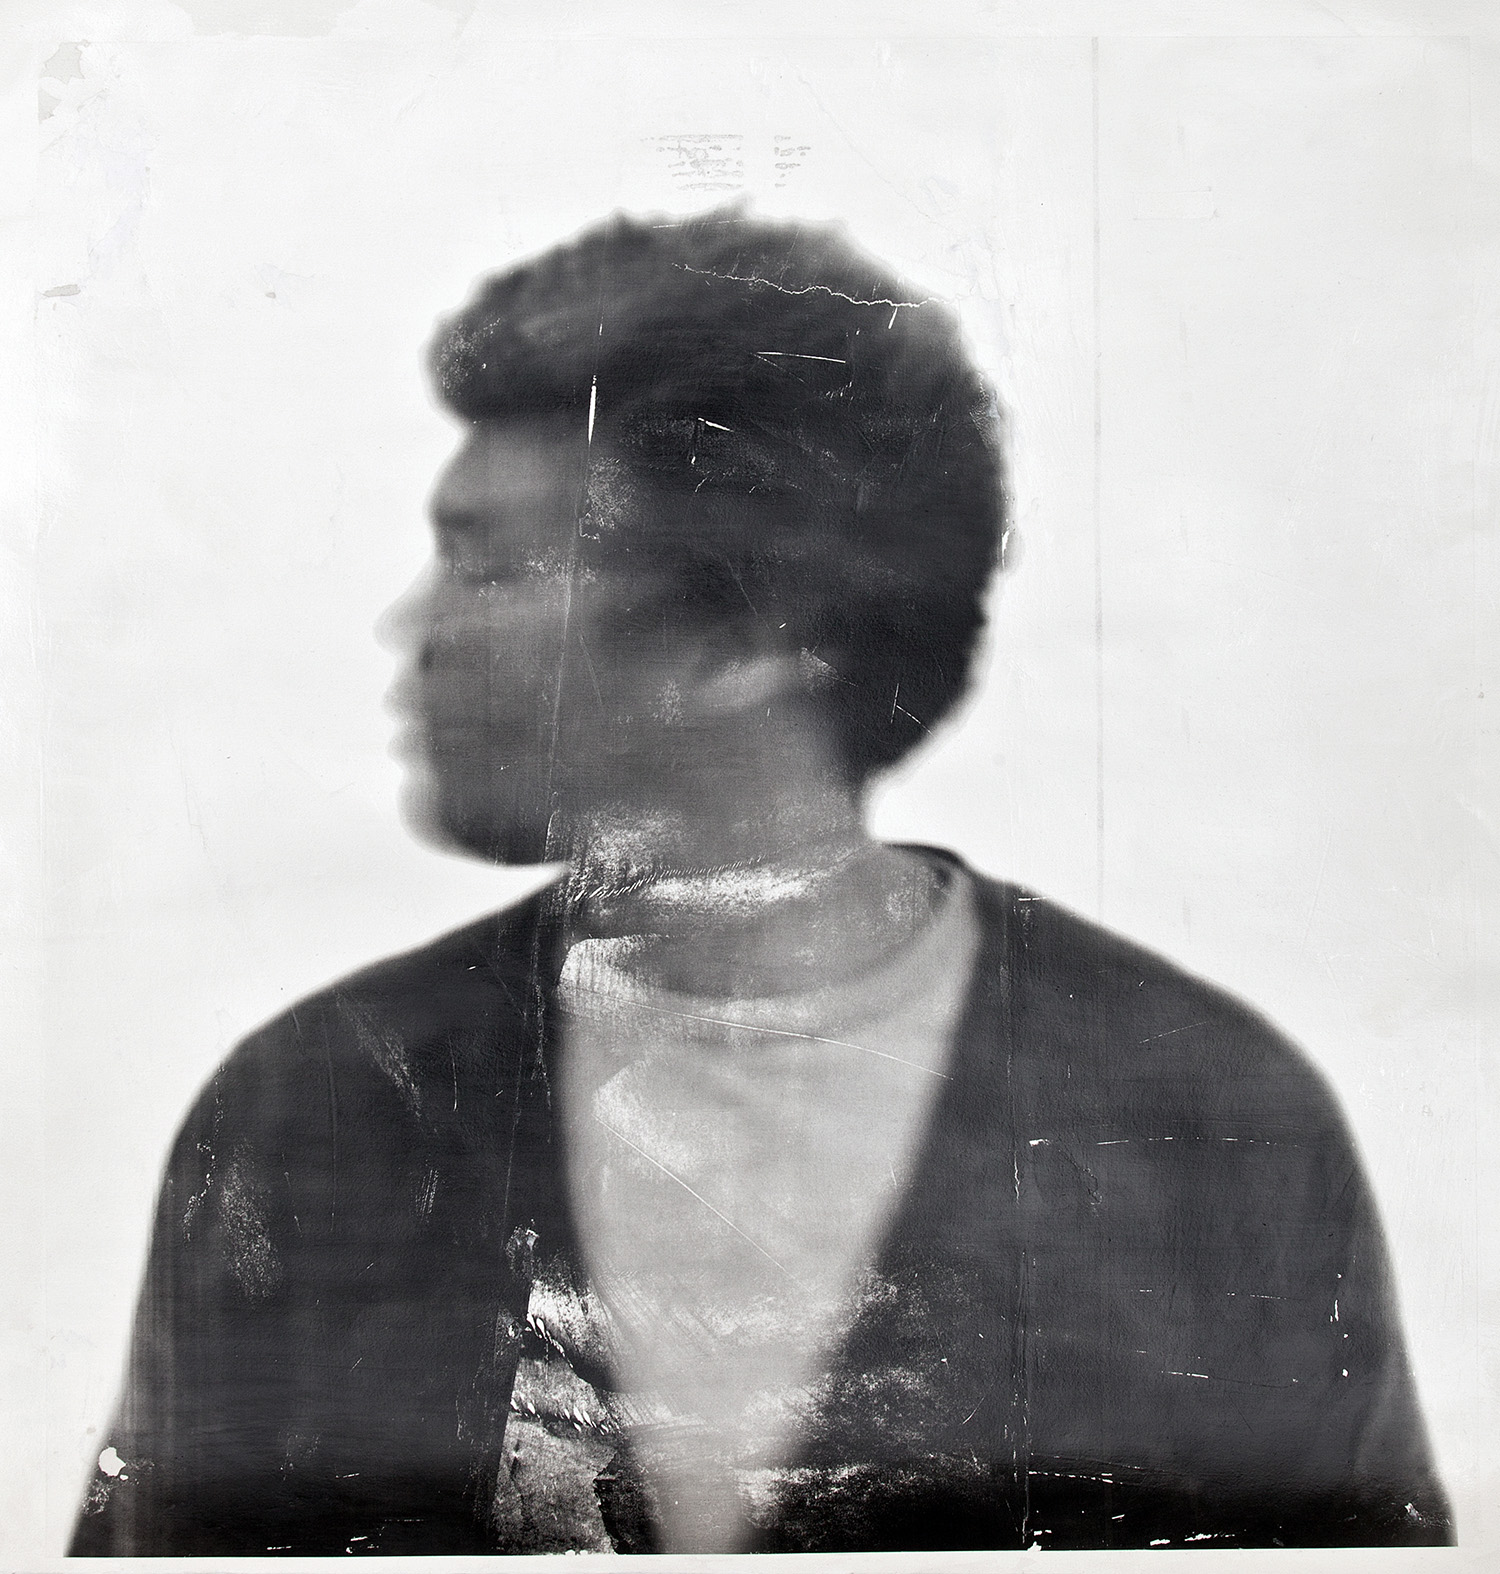 Blur 19 , 2017, paper 40 x 38 inches, photo-based gel medium transfer on archival paper, unique